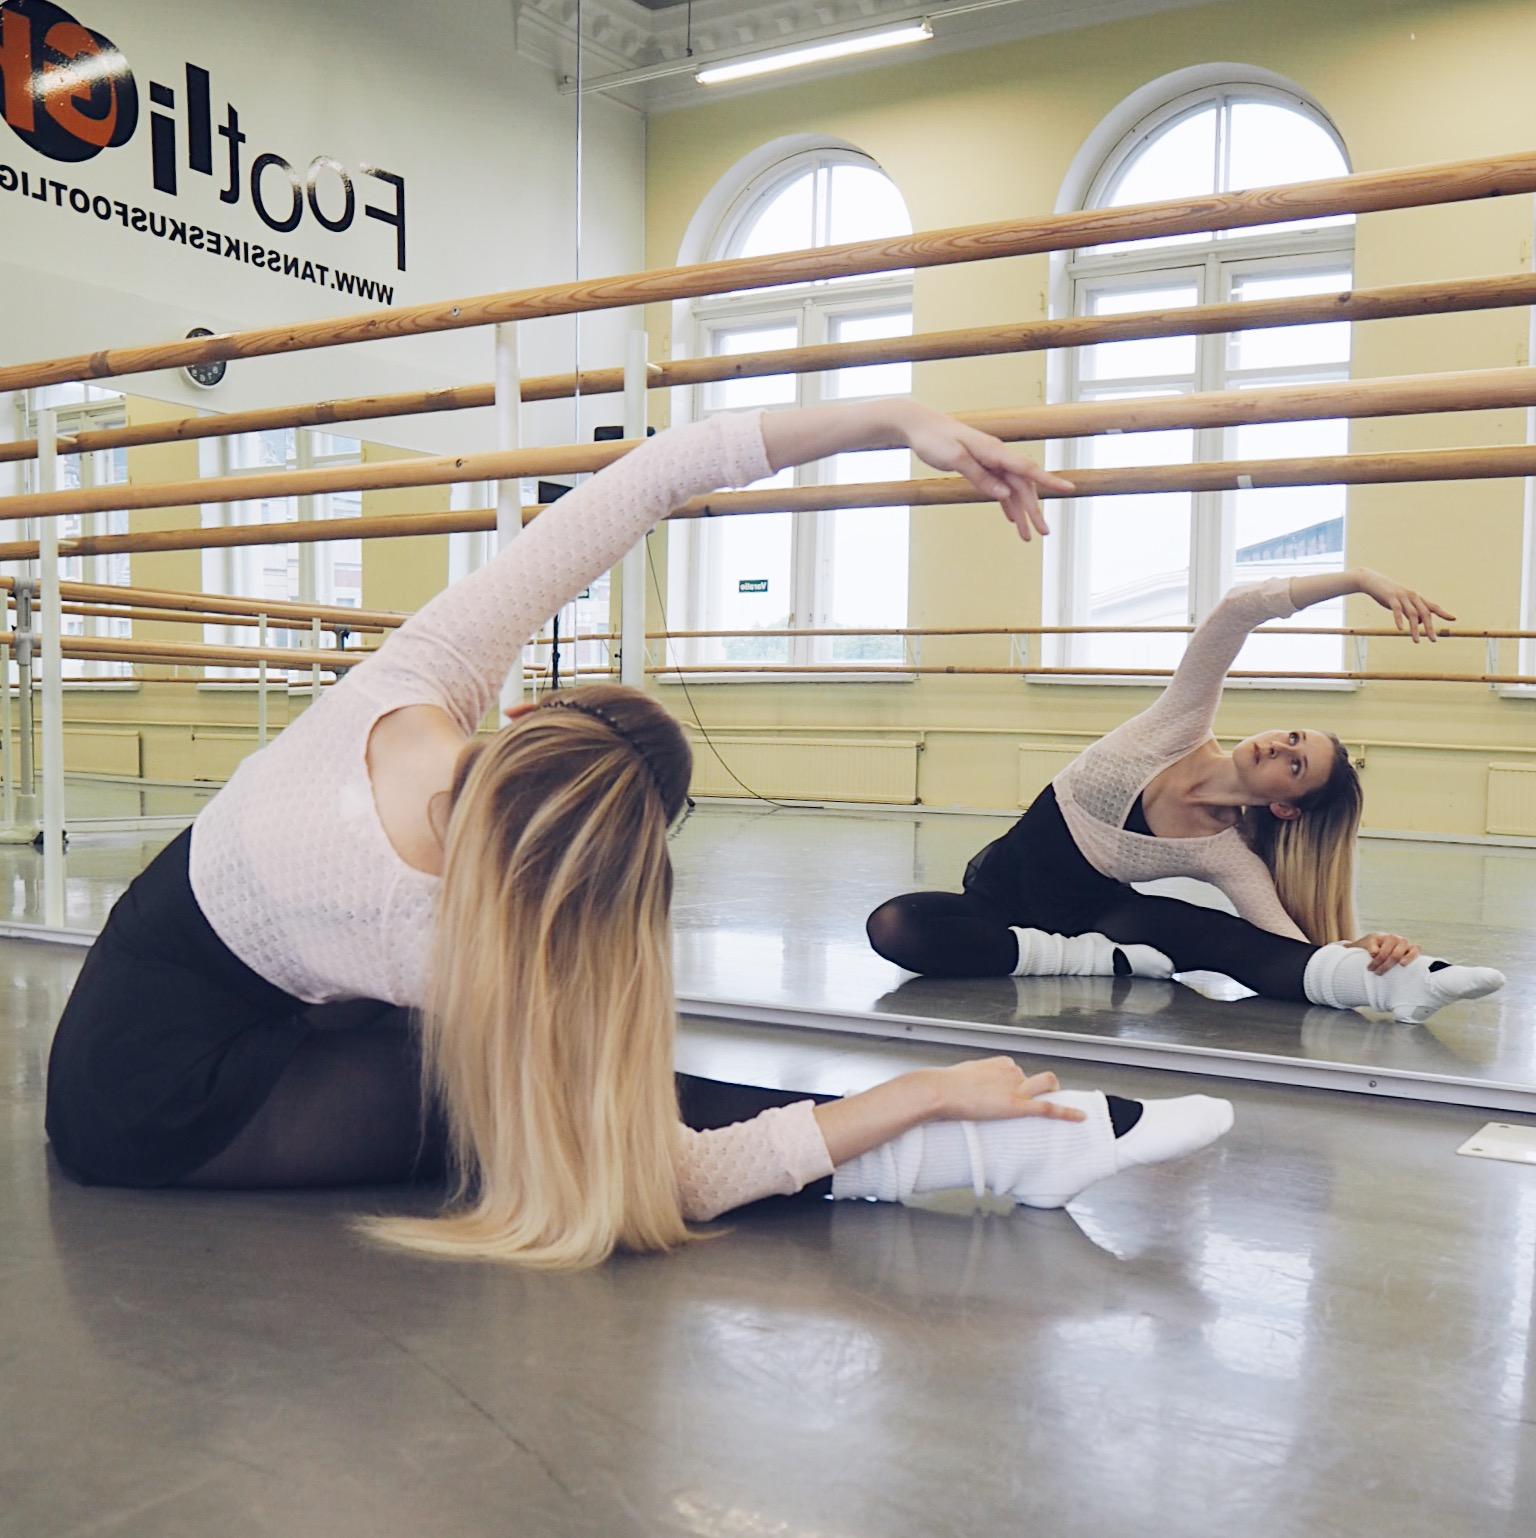 footlightanssikoulu_baletti-2.jpg